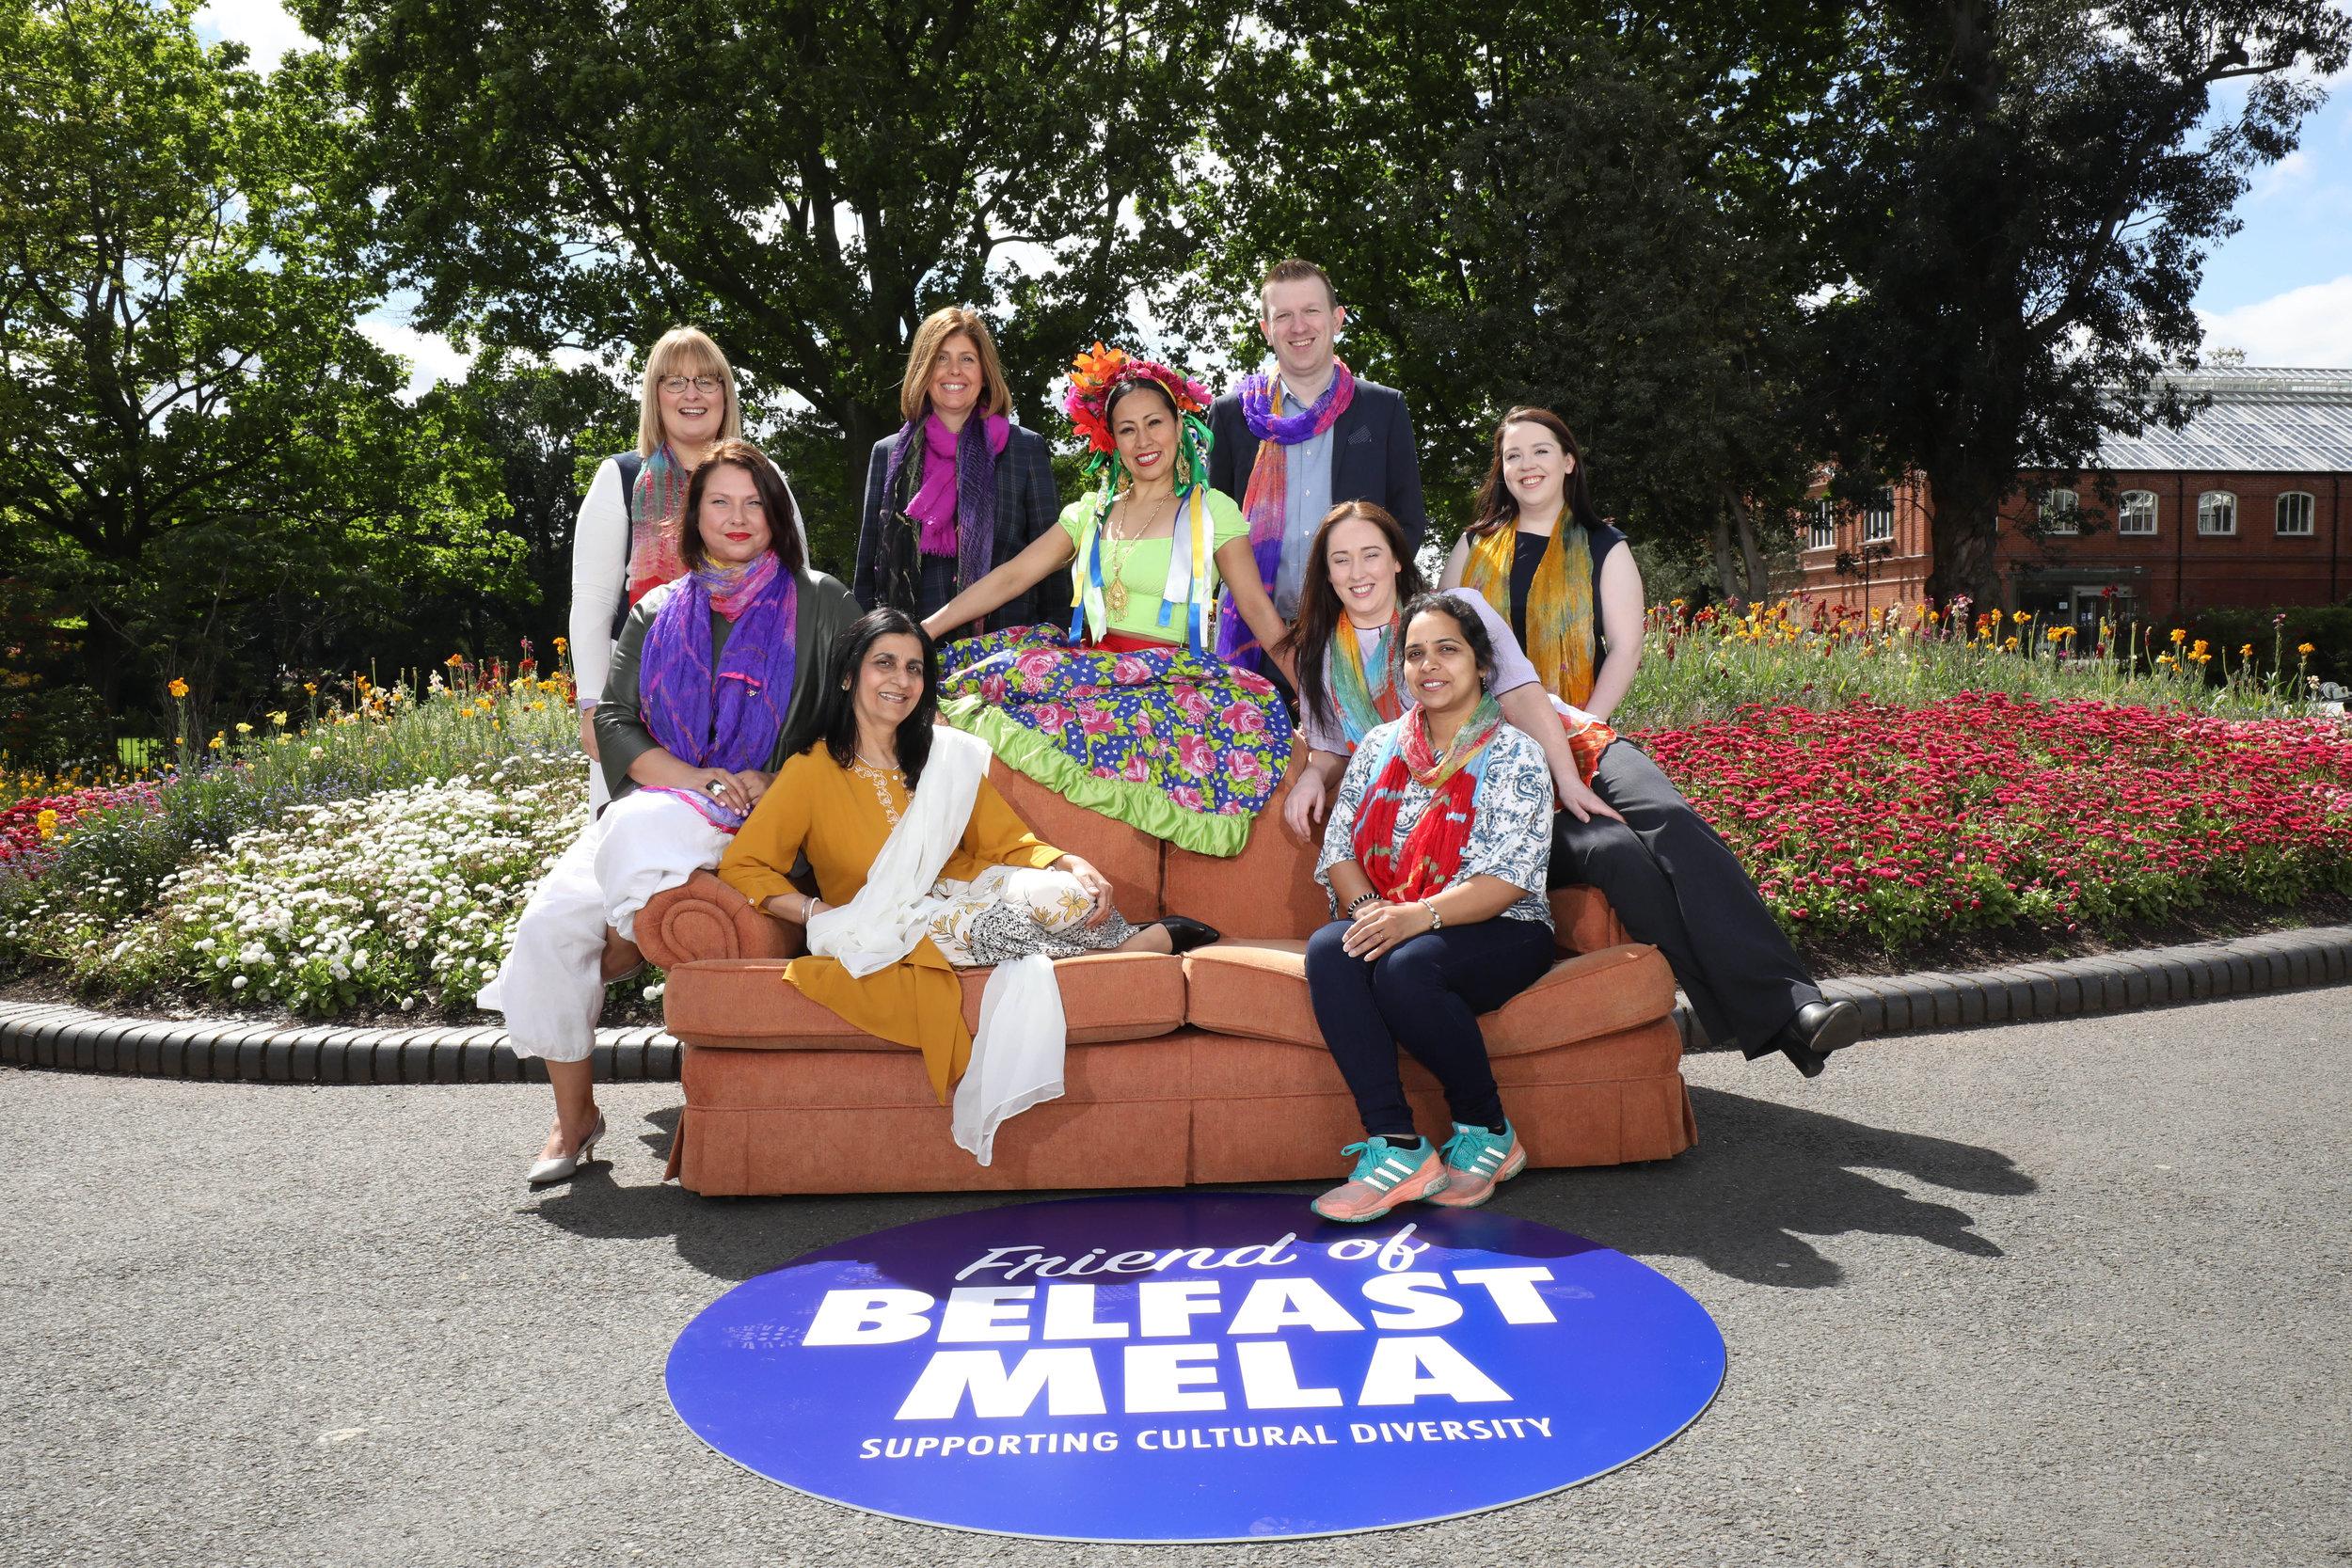 Friends of Belfast Mela gathered in Botanic Gardens to launch ArtsEkta's new diversity initiative. Pictured (l to r - back row) are Gillian Orr, Phoenix Natural Gas; Claire McBride, Olenick; Caroline van der Feltz, Danske Bank; Mexican dancer Mayte Segura; John Boyd, Hannon Travel; Kelly Clifford, First Trust and Ciara Smyth, Belfast Harbour with Nisha Tandon, ArtsEkta and Annapurna Nallaka, AllState seated on the 'Friends' sofa. (©Press Eye/Darren Kidd)